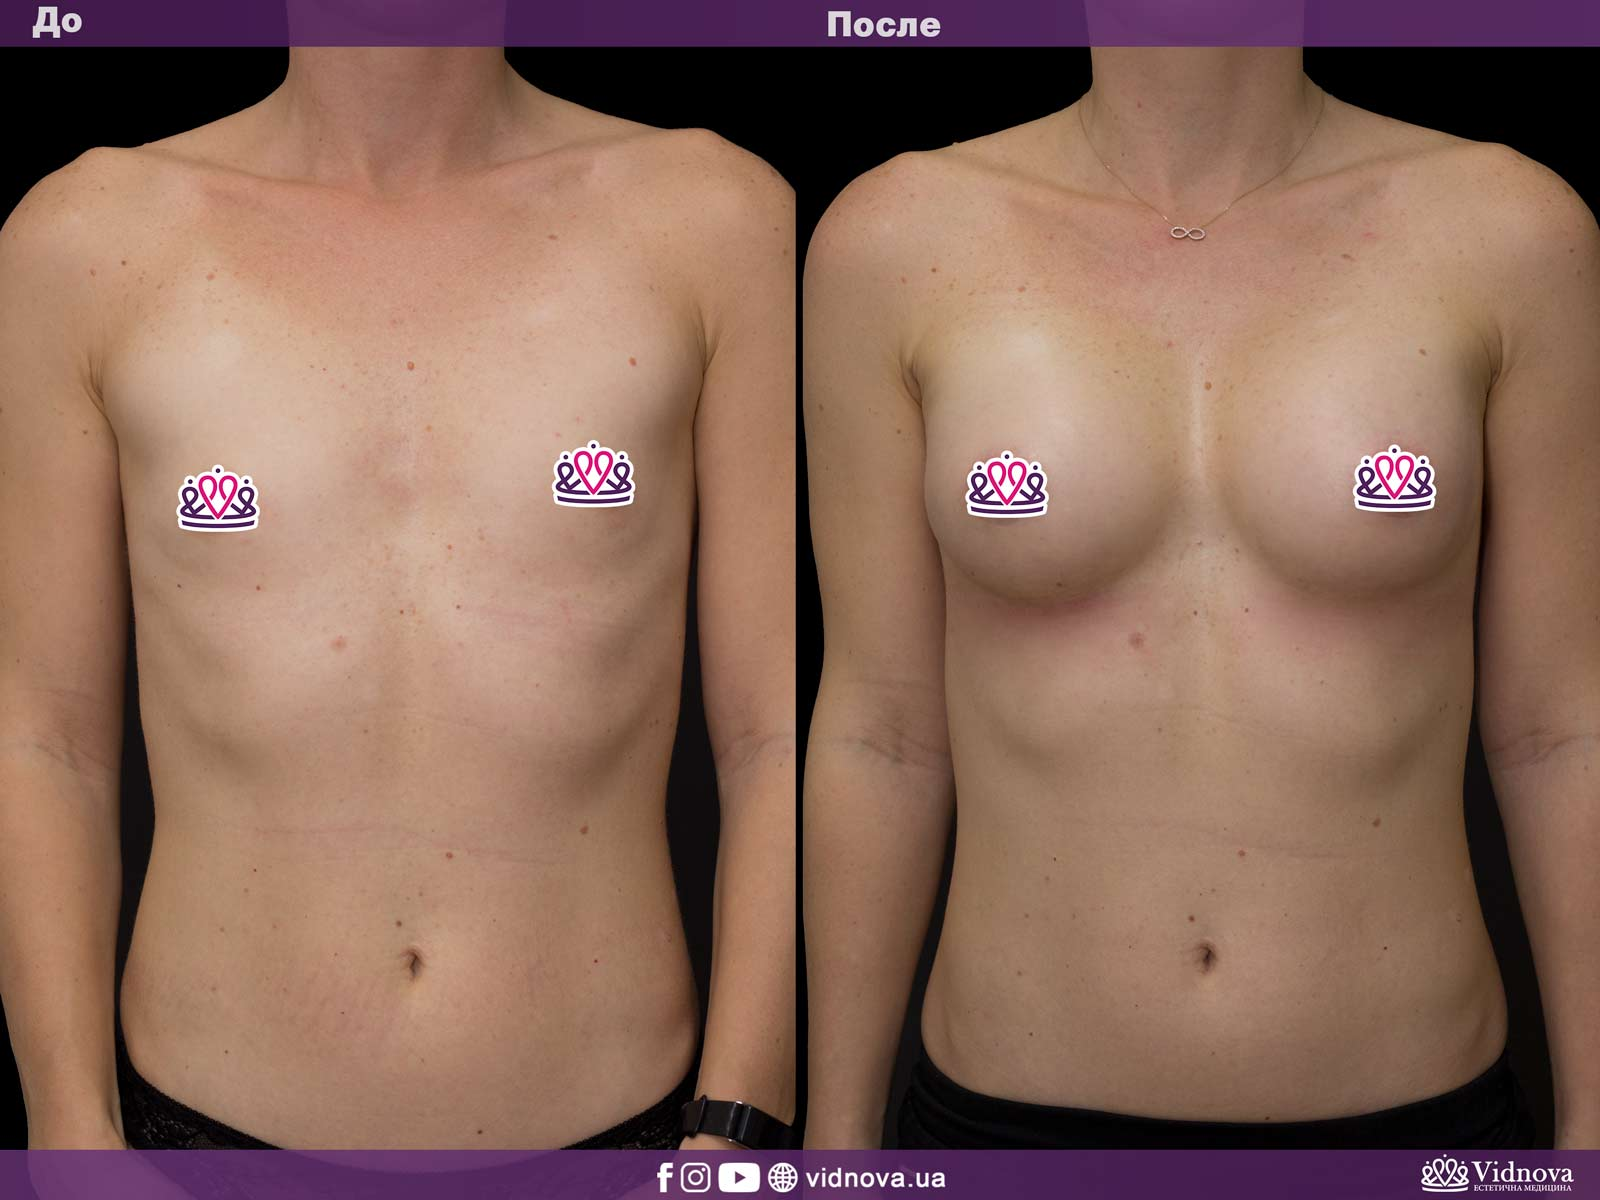 Увеличение груди: Фото ДО и ПОСЛЕ - Пример №29-1 - Клиника Vidnova